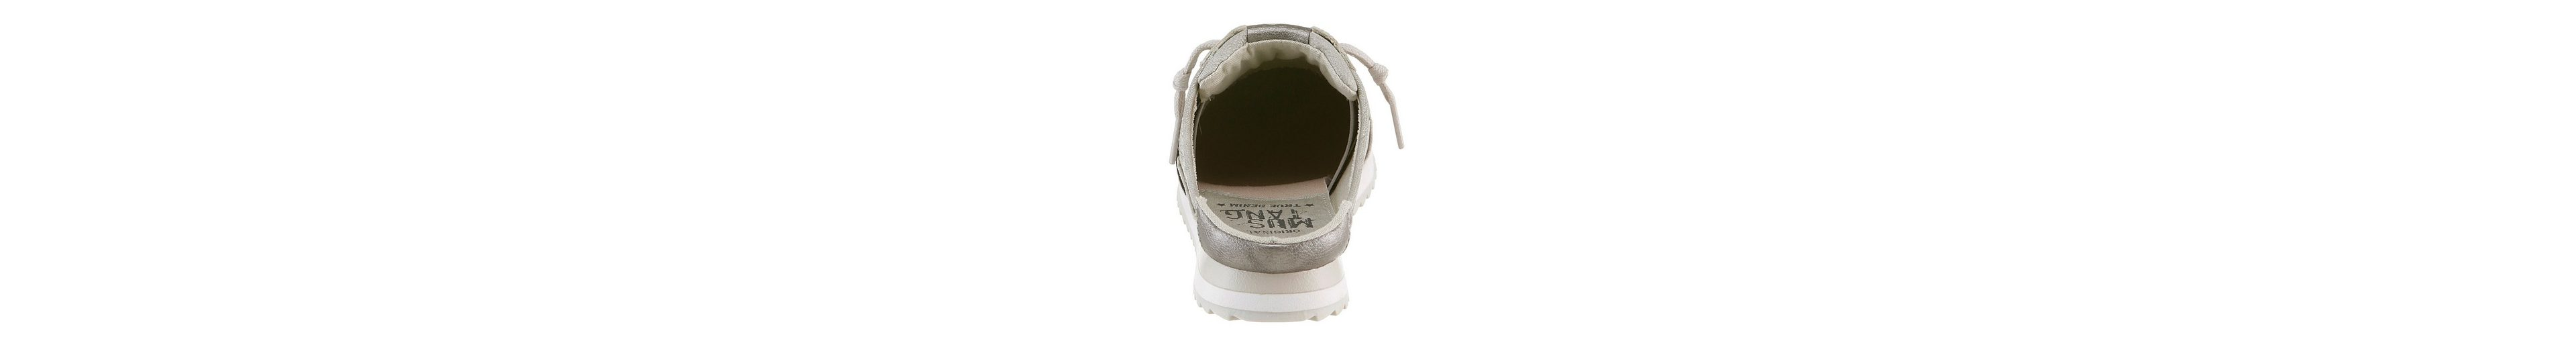 Mustang Shoes Clog, mit Strass-Steinen